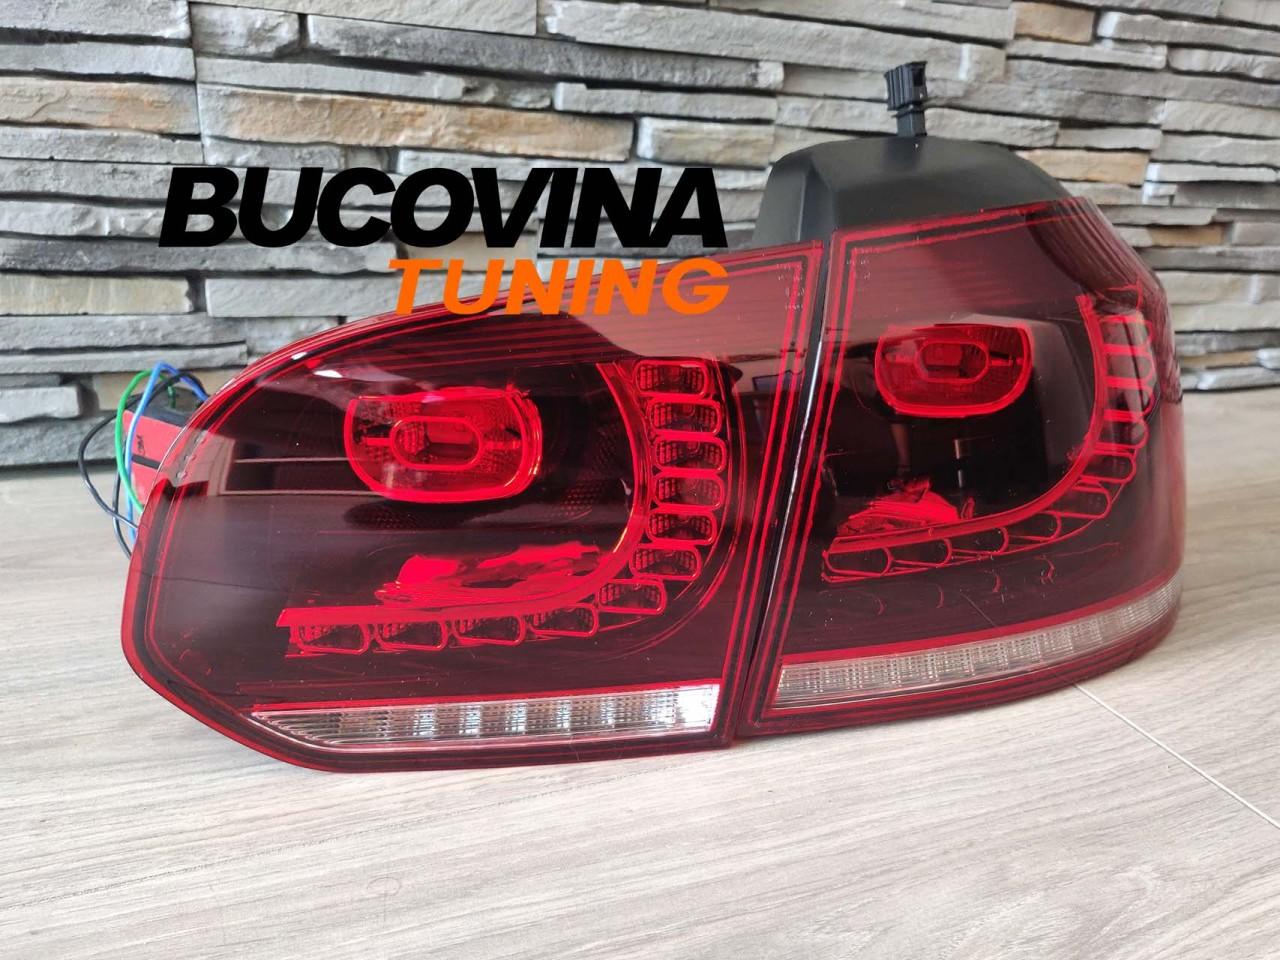 STOPURI FULL LED CU SEMNALIZARE SECVENTIALA DINAMICA VW GOLF 6 (2008-2012)